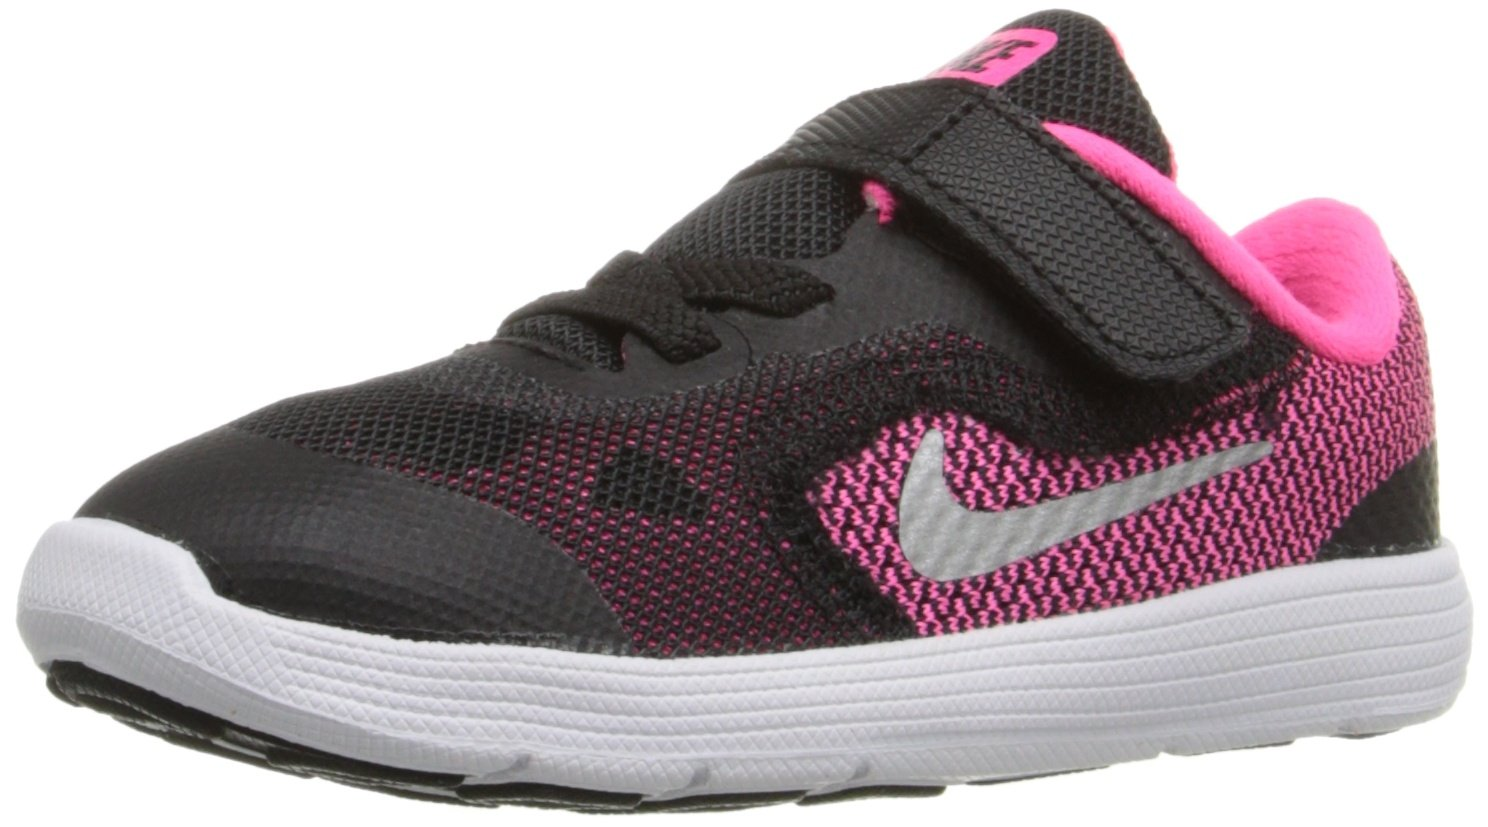 Running Shoe Chlorine Blue//White//Racer Pink//Black 8 M US Toddler 819418 Nike Kids Revolution 3 TDV